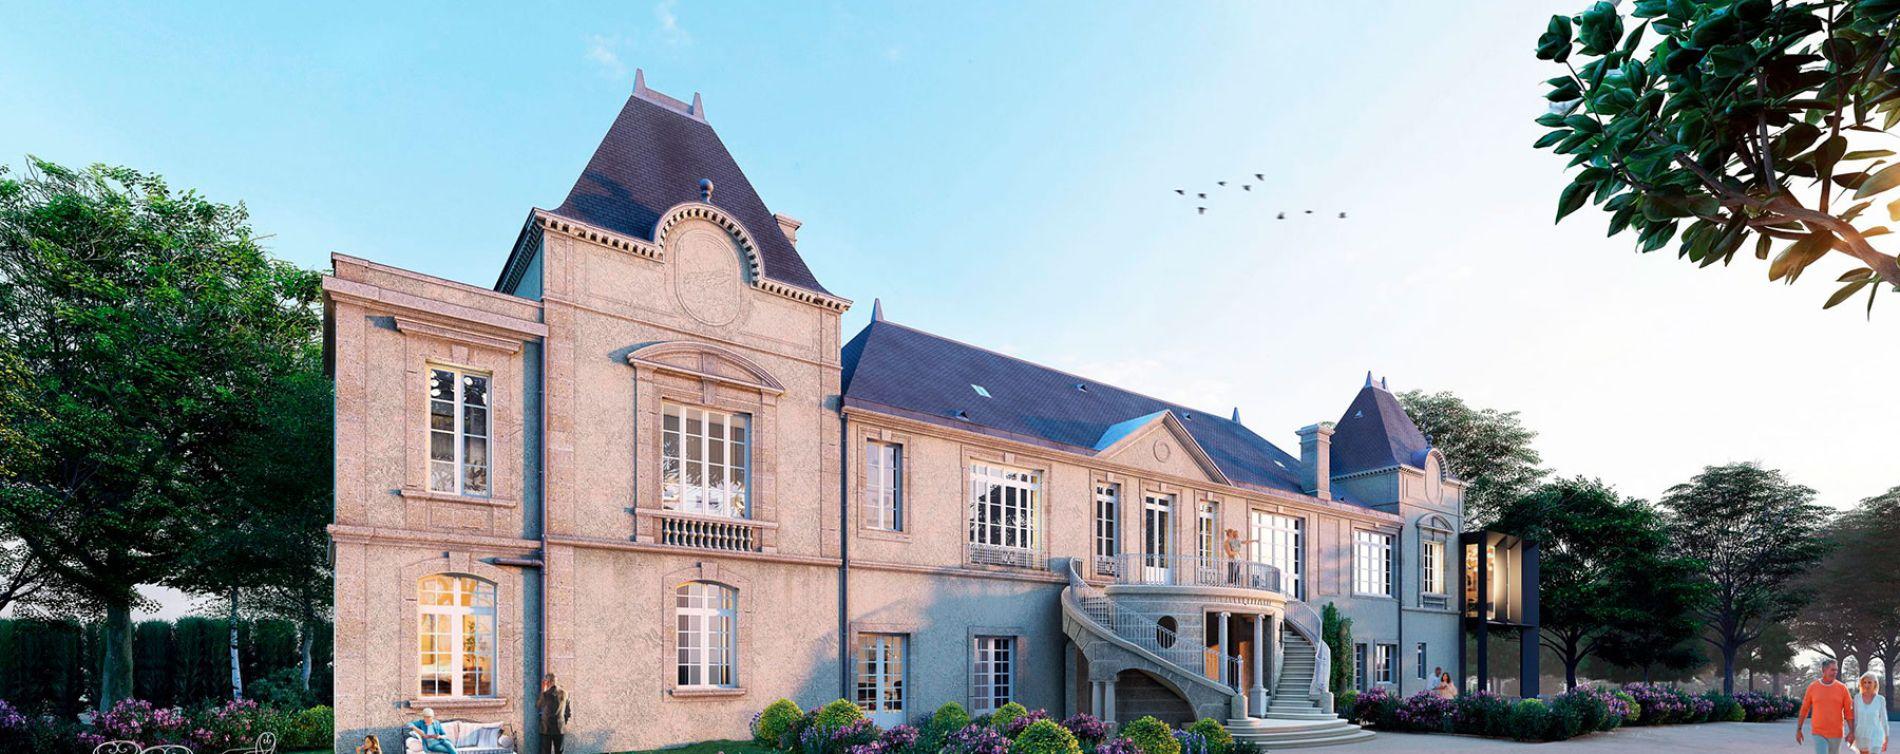 Résidence Abbaye de Bonlieu à Sainte-Eulalie